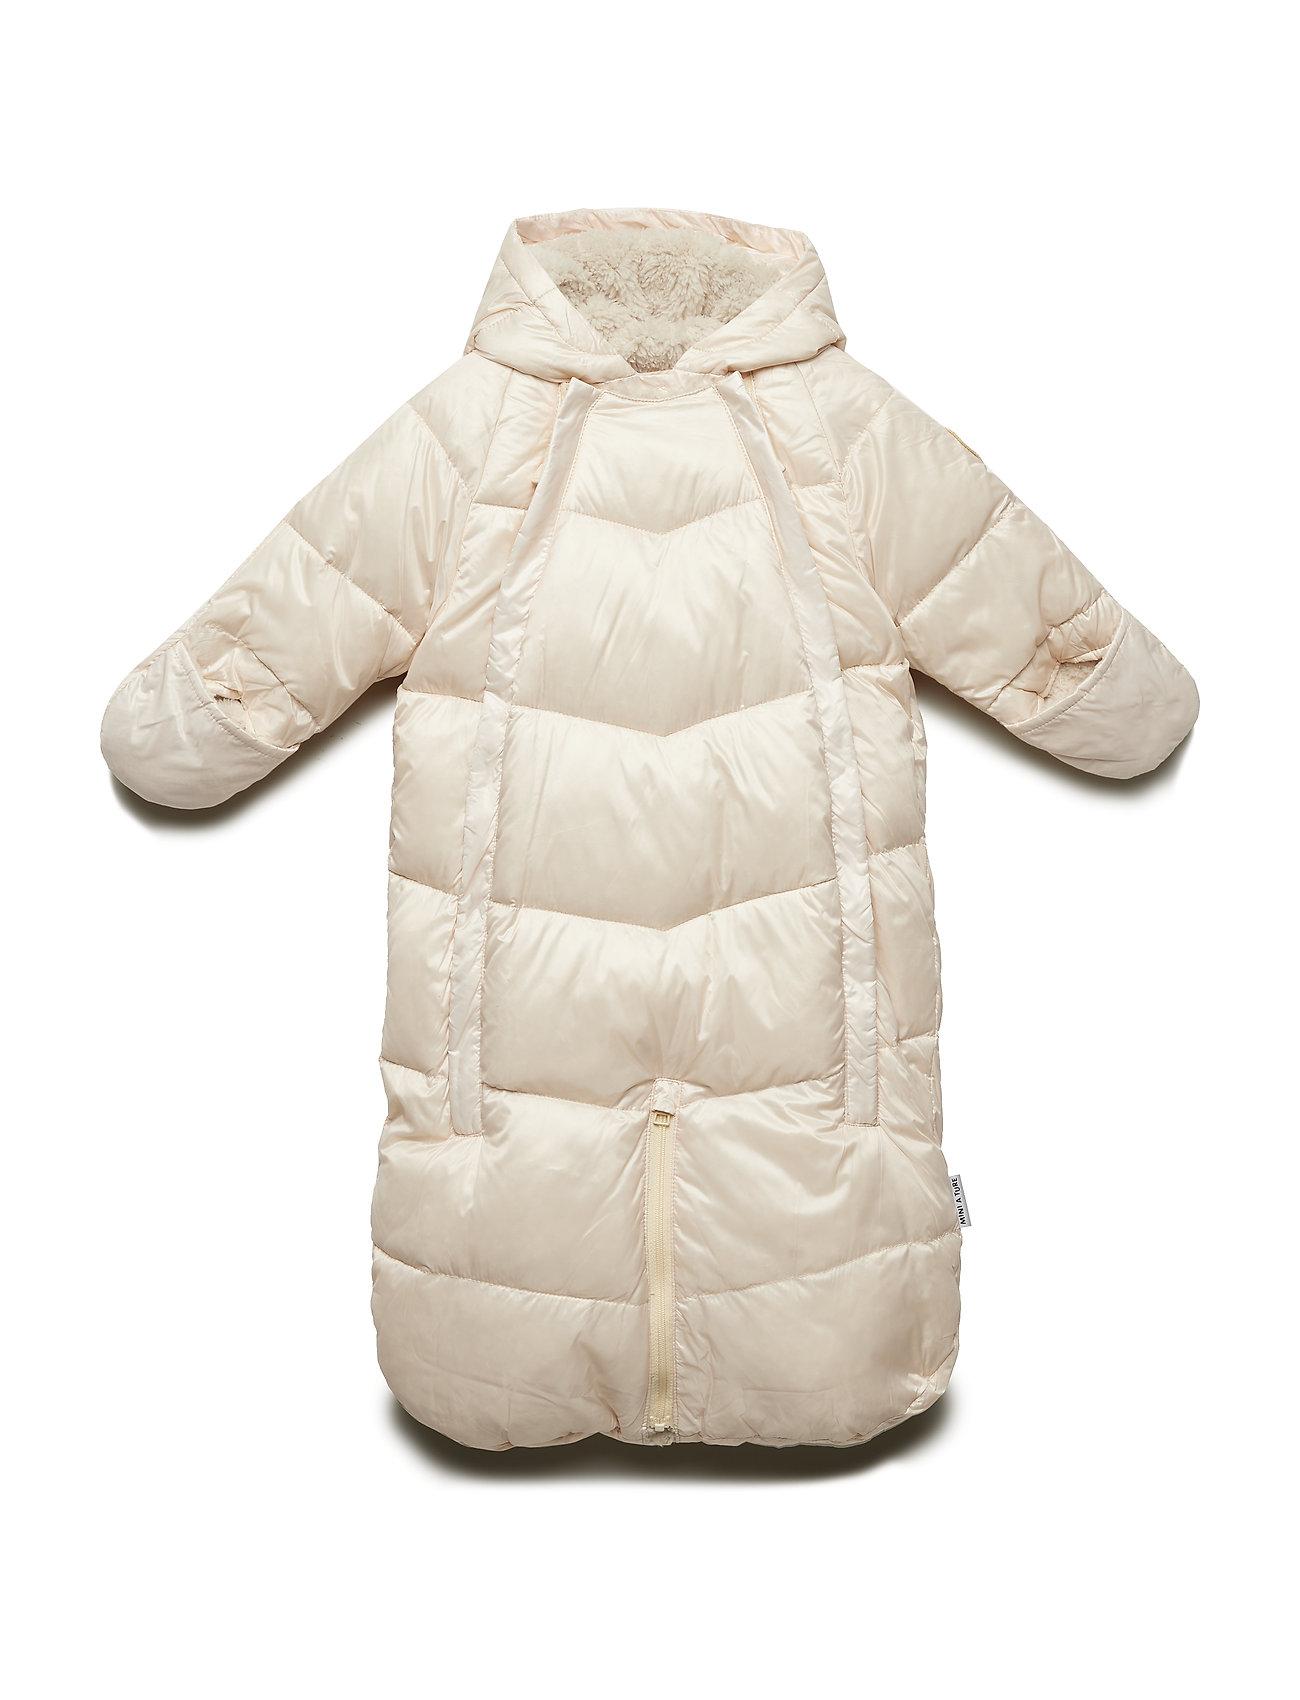 Mini A Ture Yoko Baby Bag, B - CRéME DE PECHE